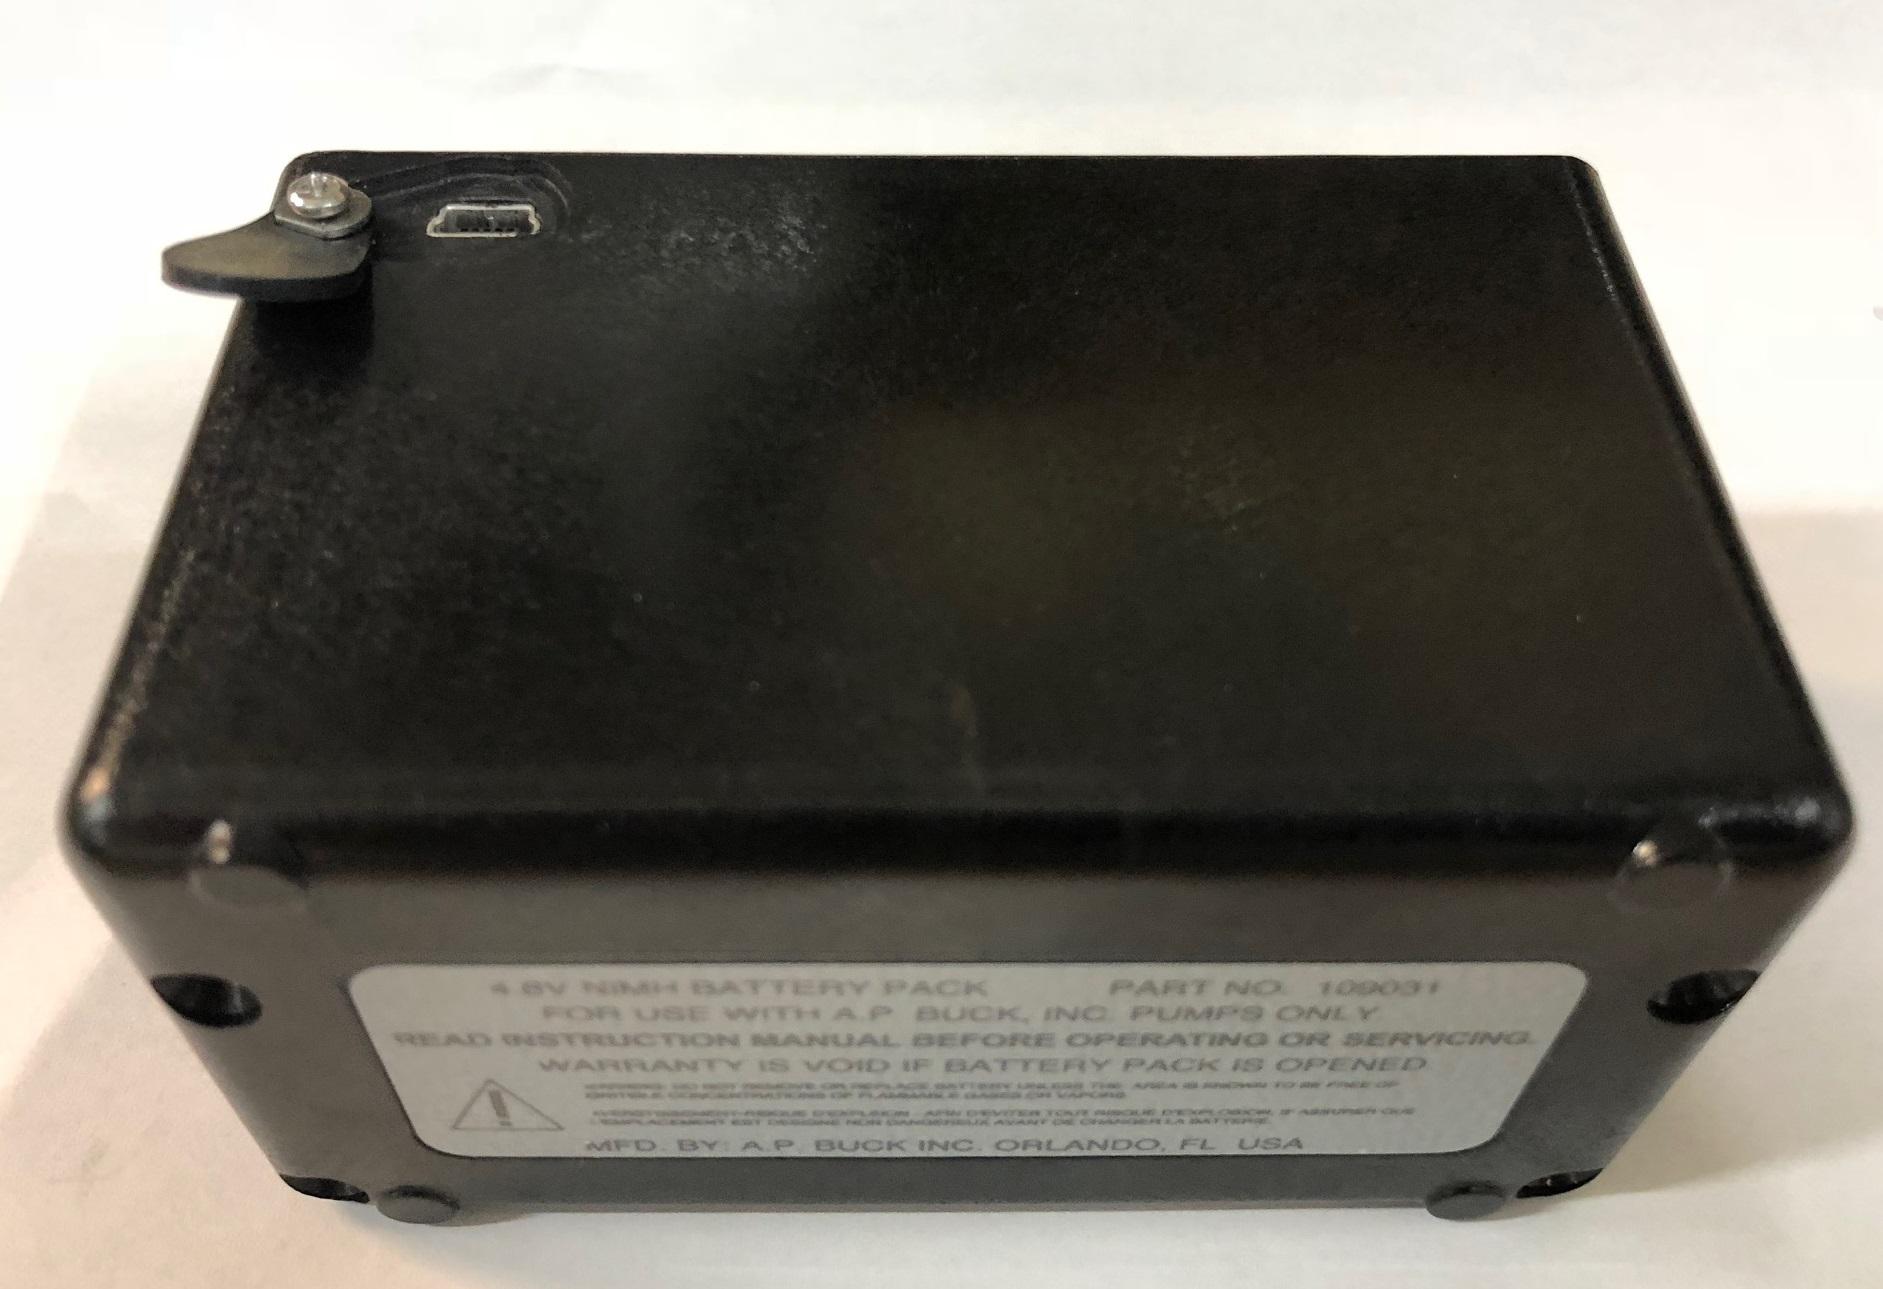 NiMH  Triple Battery Pack with USB Mini B jack for Libra/Elite pumps